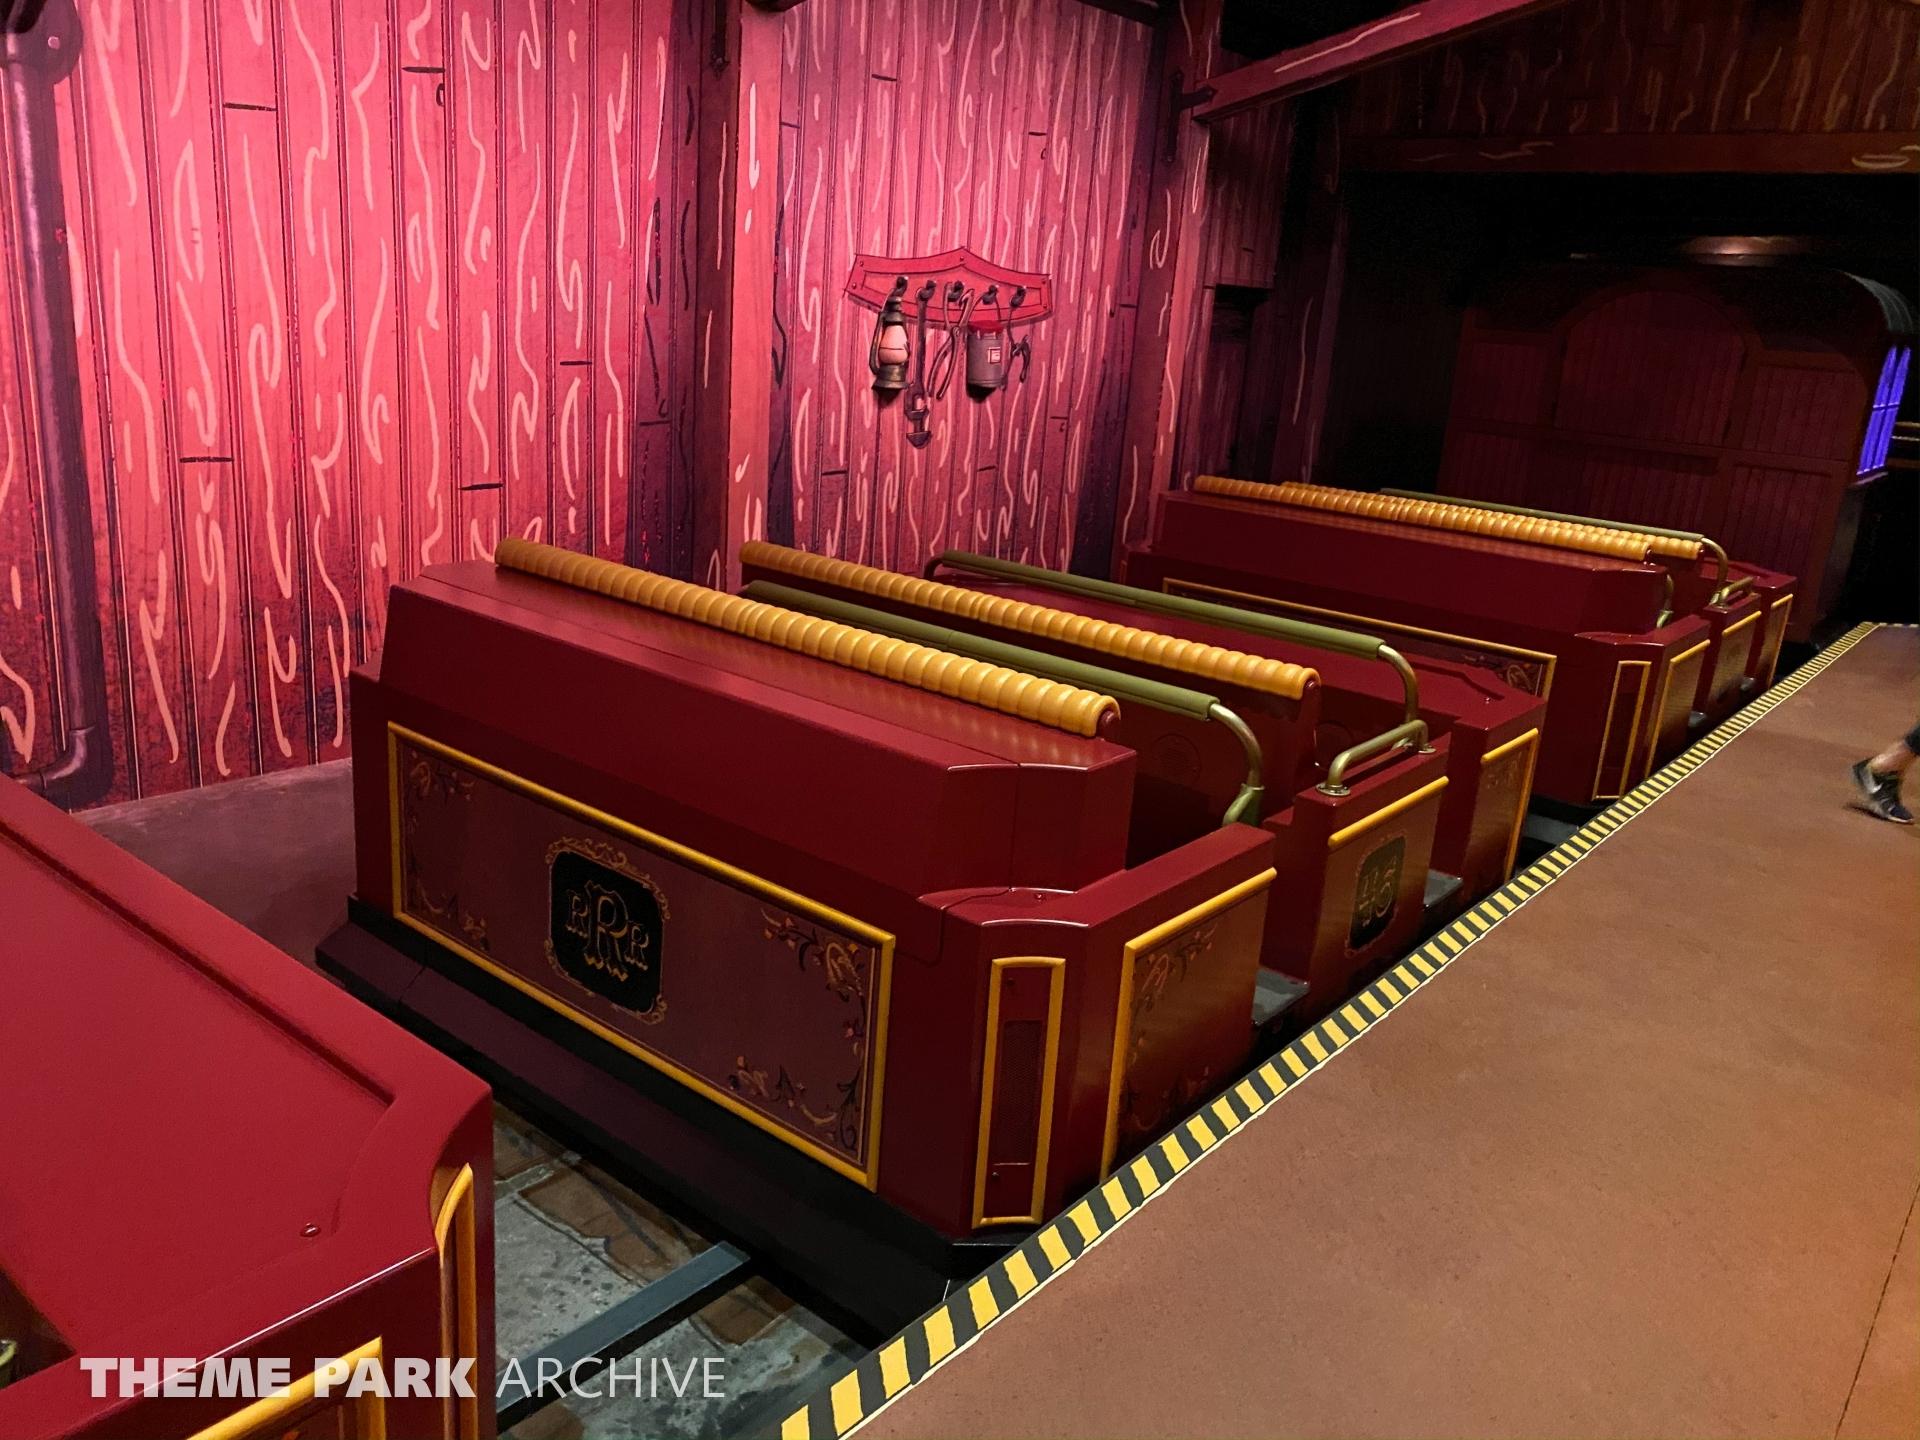 Mickey & Minnie's Runaway Railway at Disney's Hollywood Studios